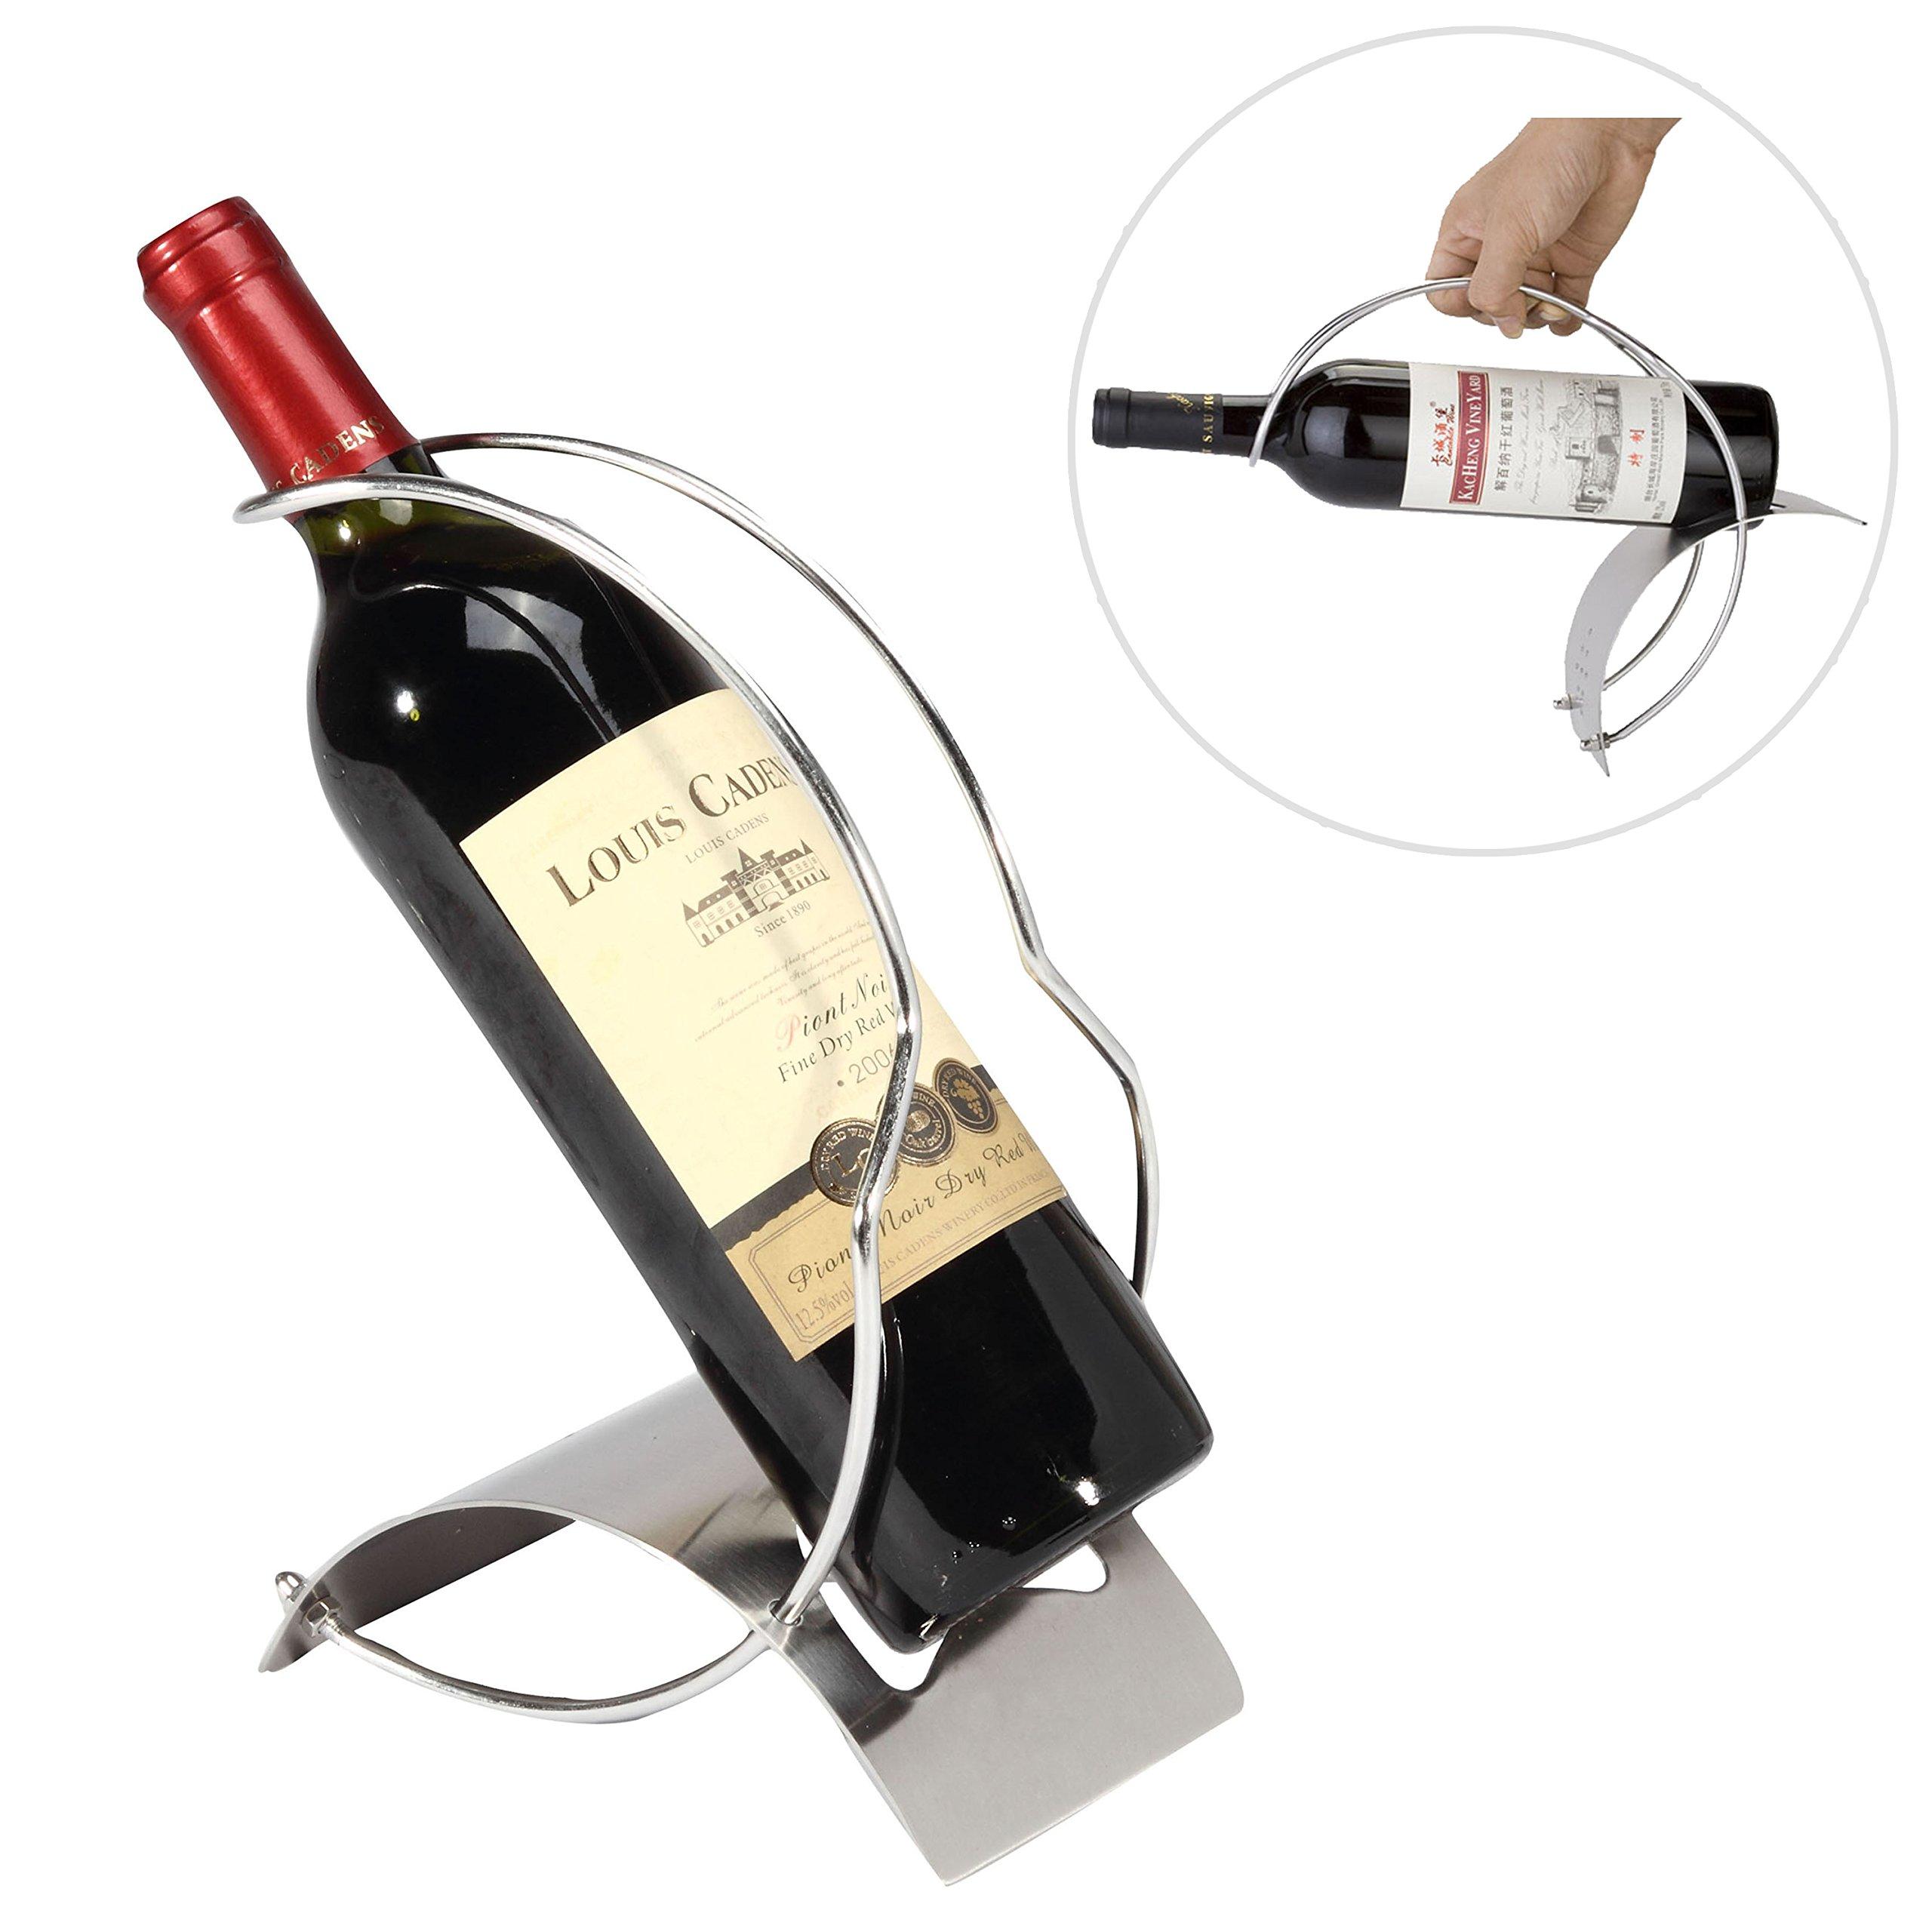 Elegant Sleek Modern Stainless Steel Wine Bottle Serving Pourer Rack Organizer Display Stand